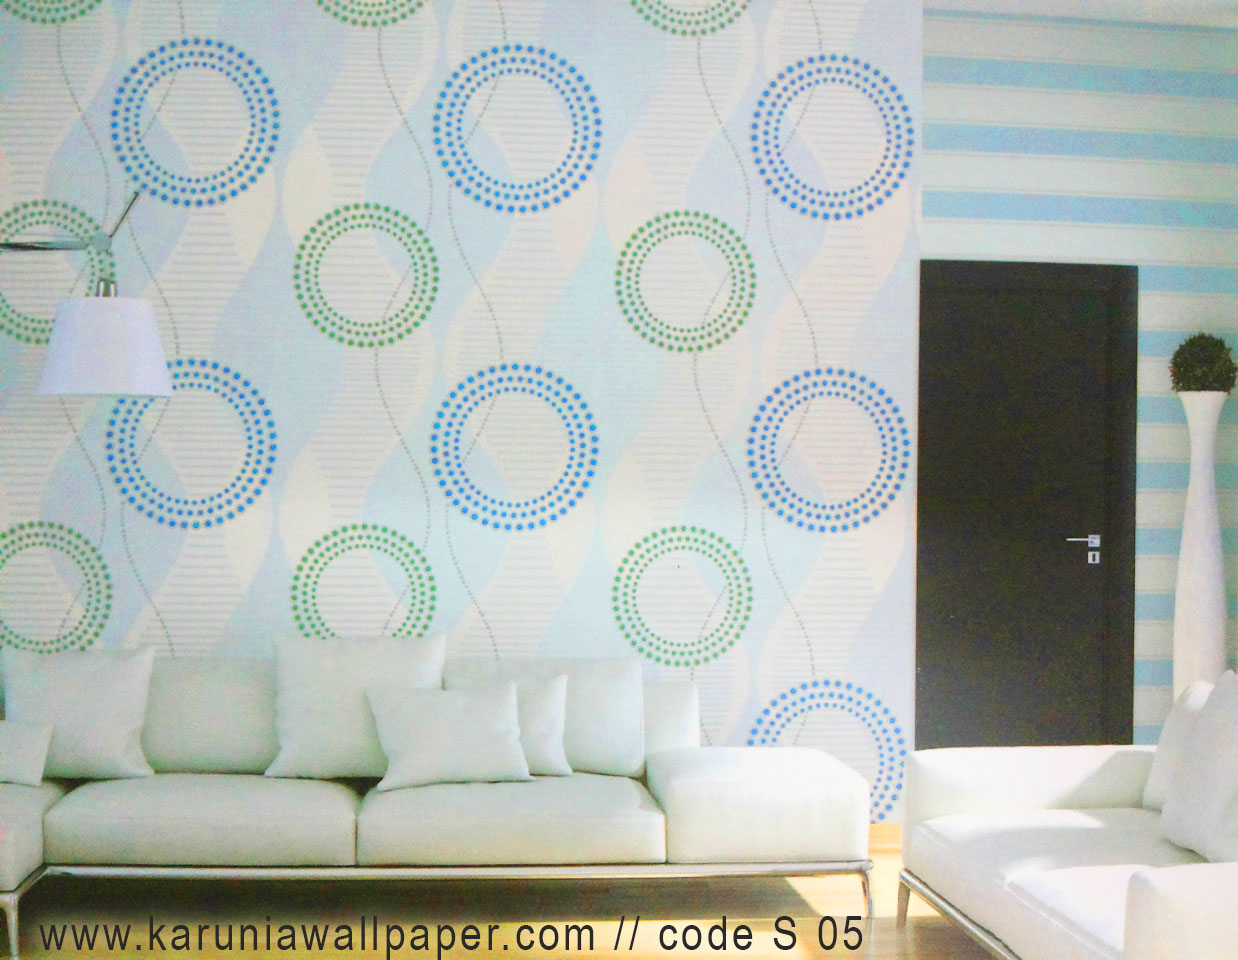 wallapepr dinding minimalis bagus  karuniawallpaper surabaya